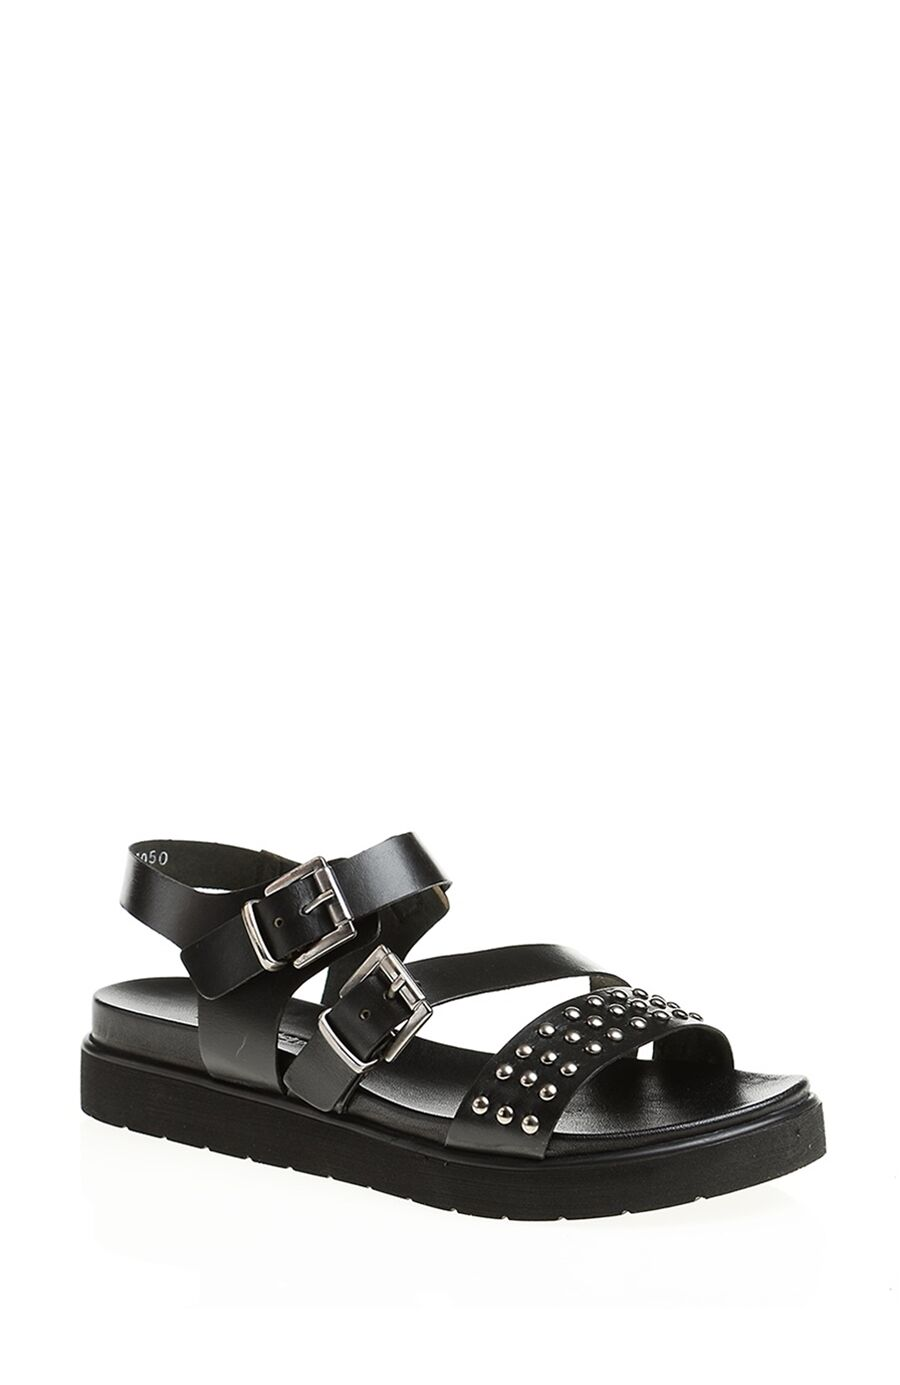 Dıvarese Trok Detaylı Siyah Sandalet – 105.0 TL